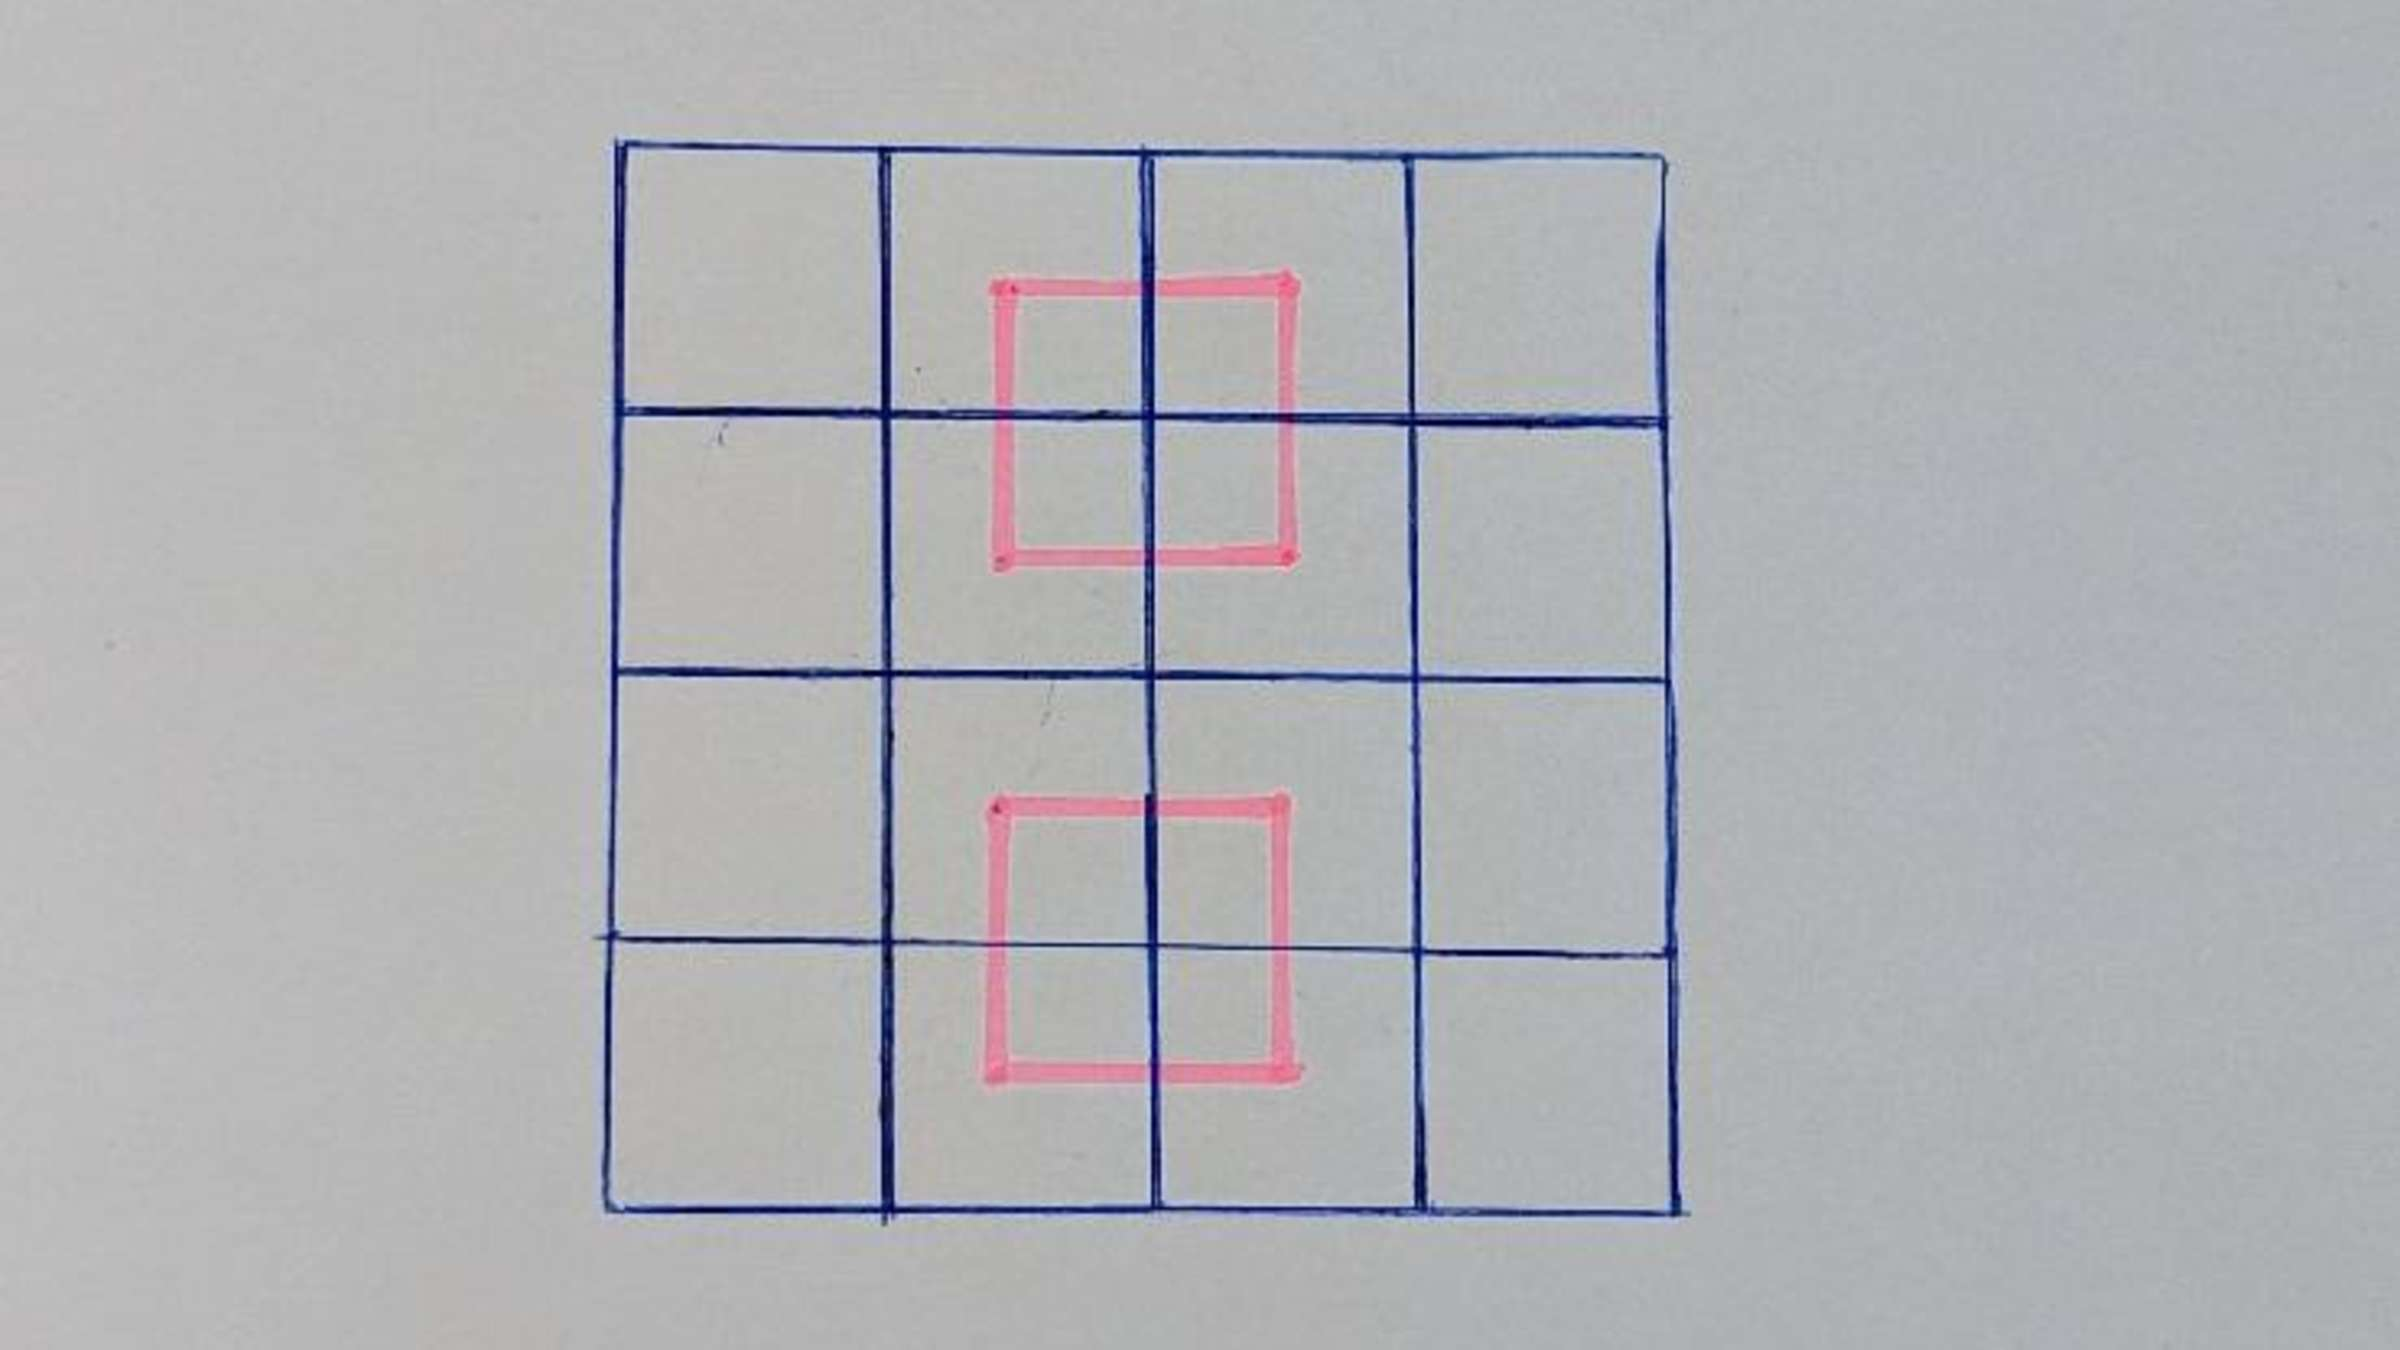 Das Quadrat-Rätsel